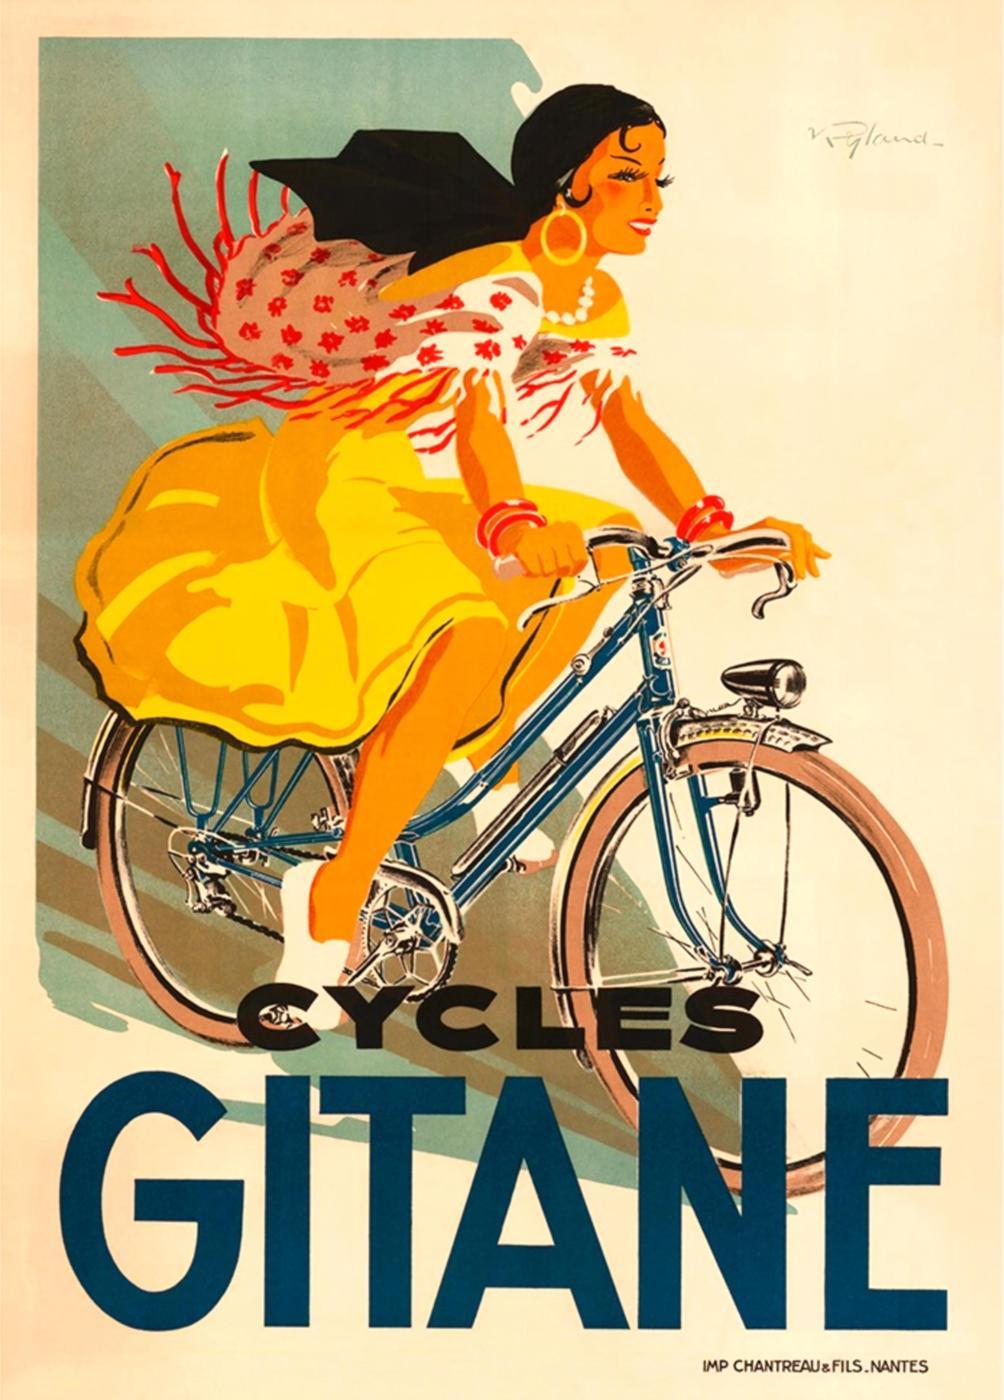 Gitane cycles